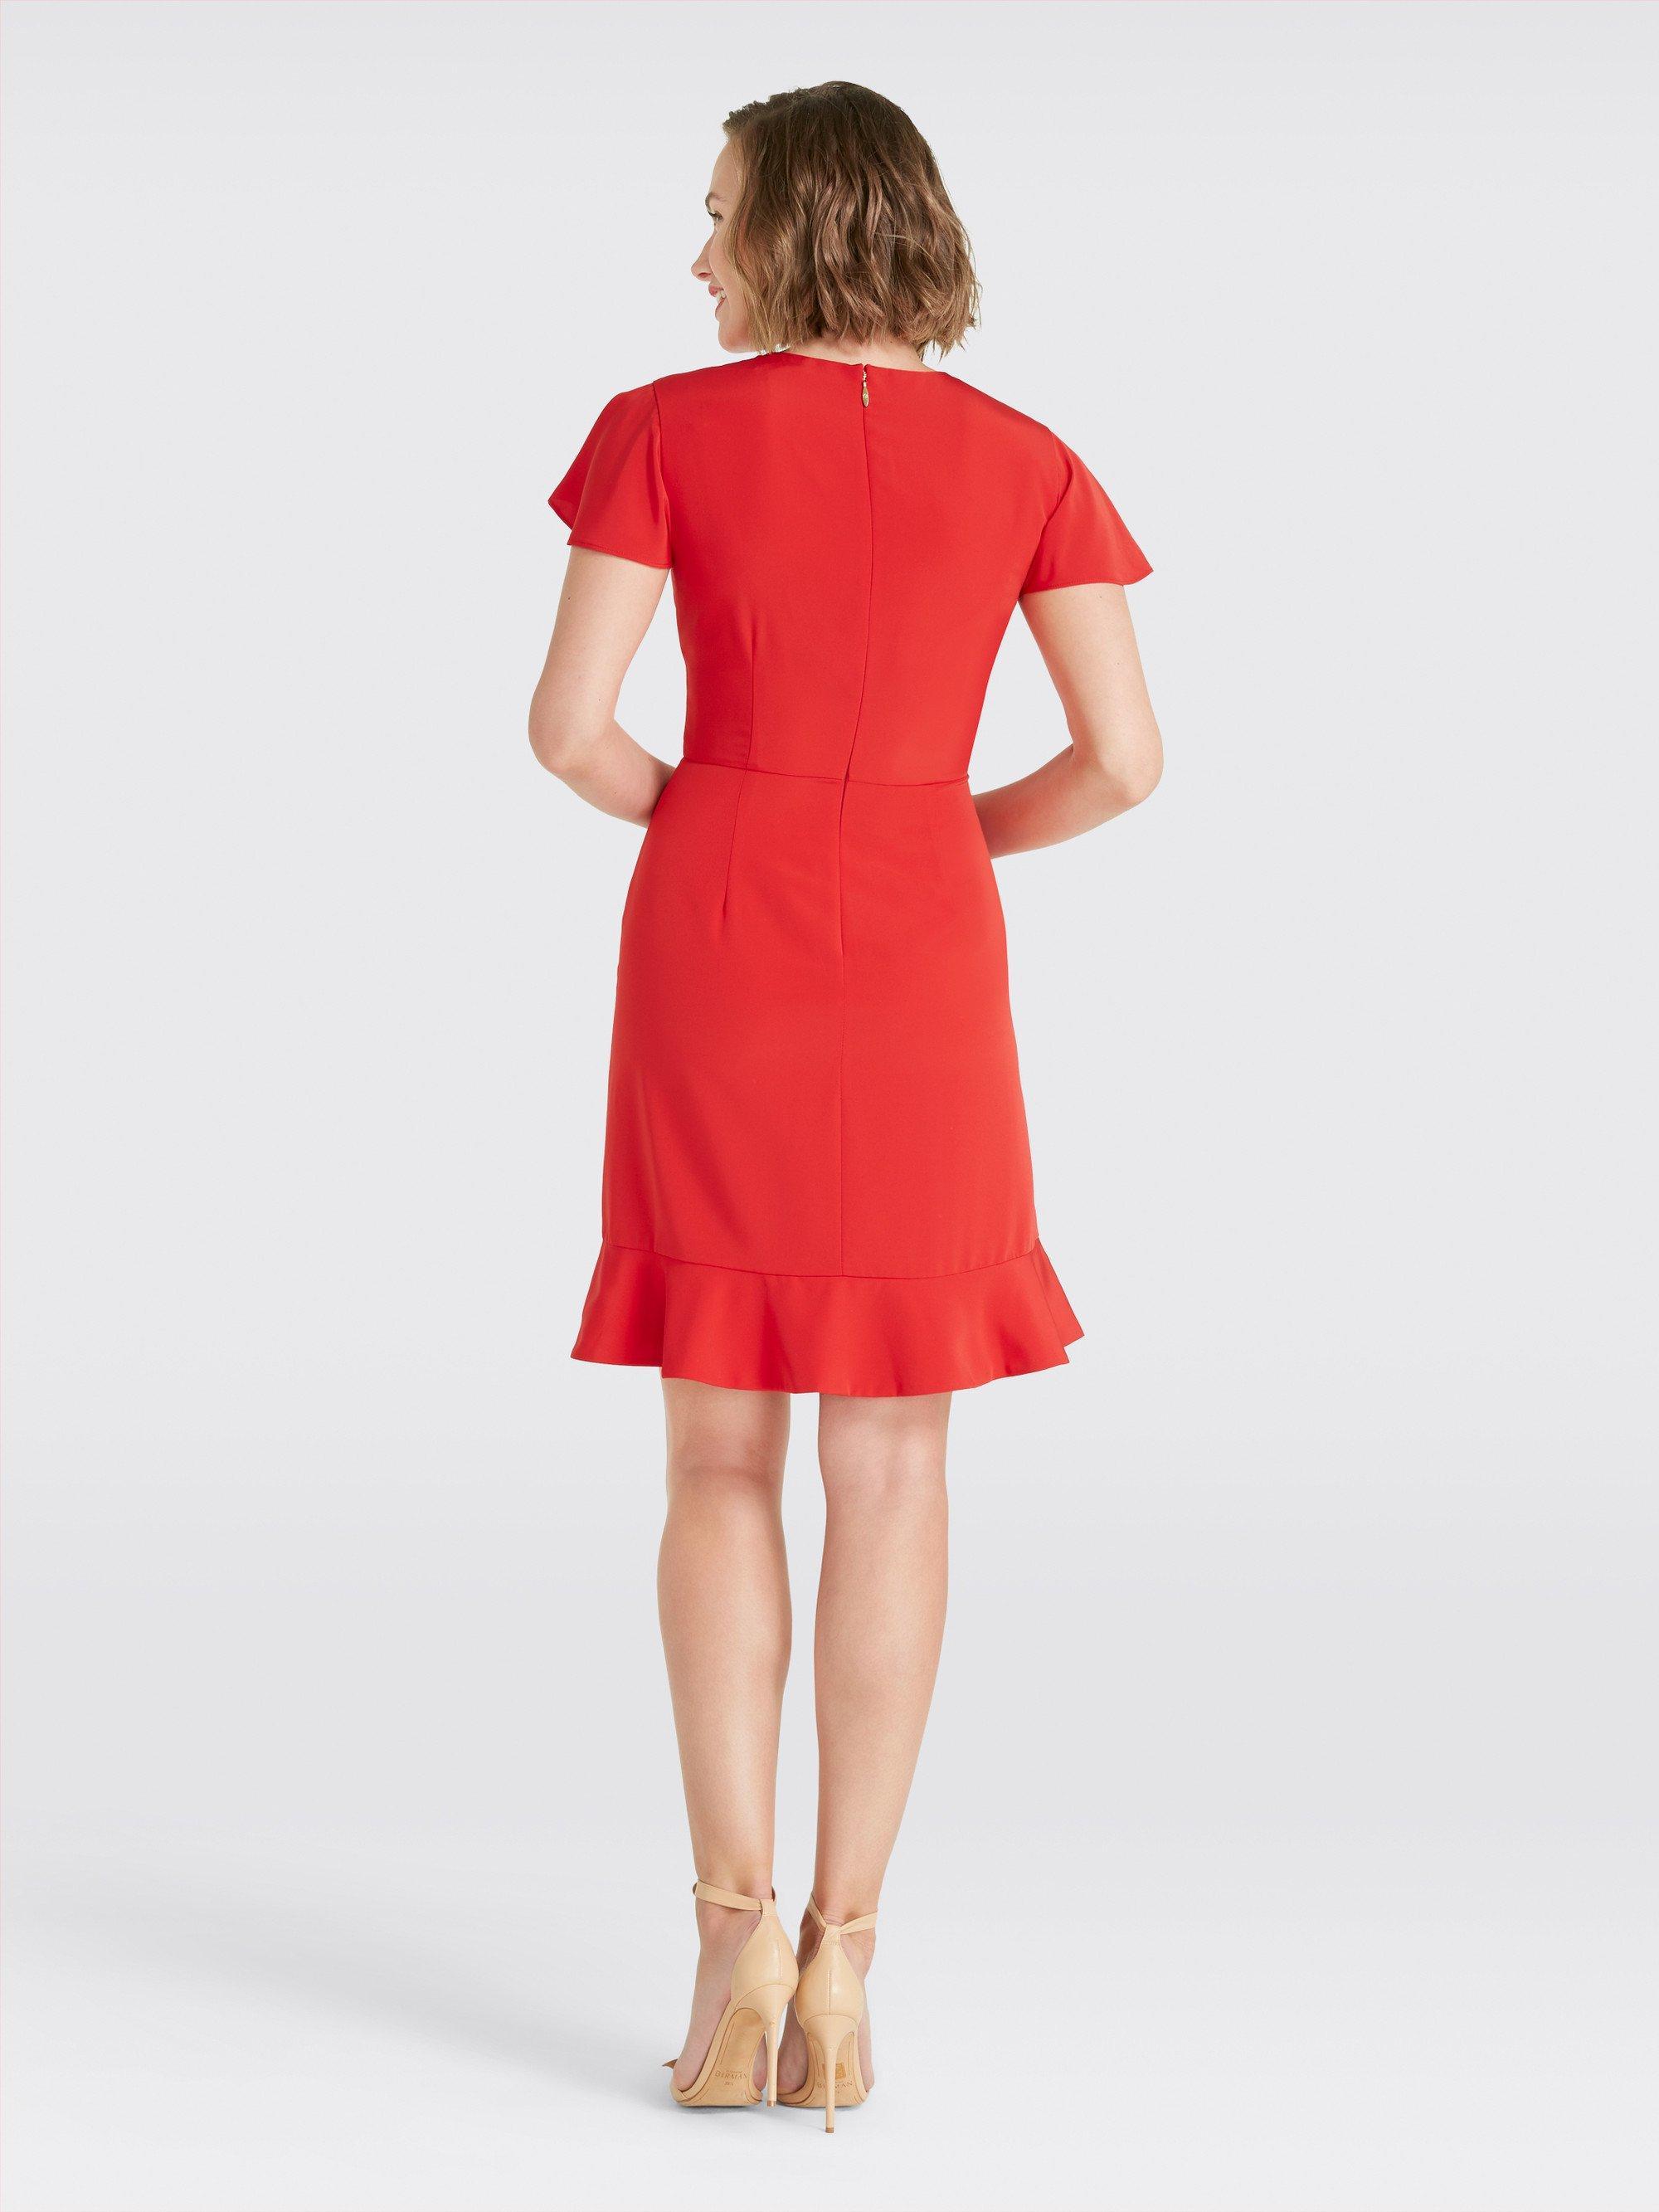 adfabefe011 Draper James - Red Solid Flutter Dress - Lyst. View fullscreen